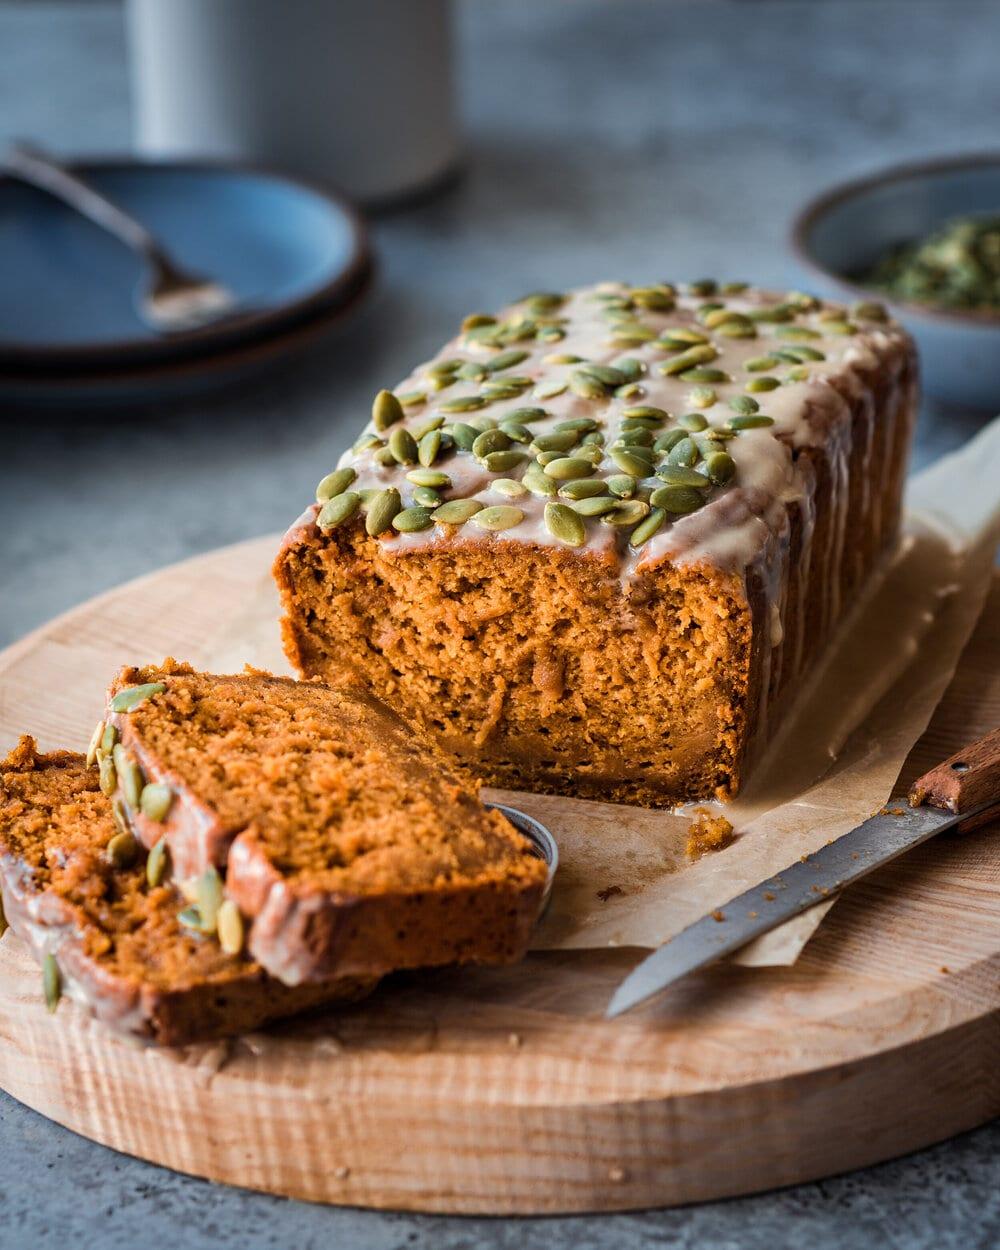 pumpkin+bread+-+2+slices+(1+of+1) (1).jpg